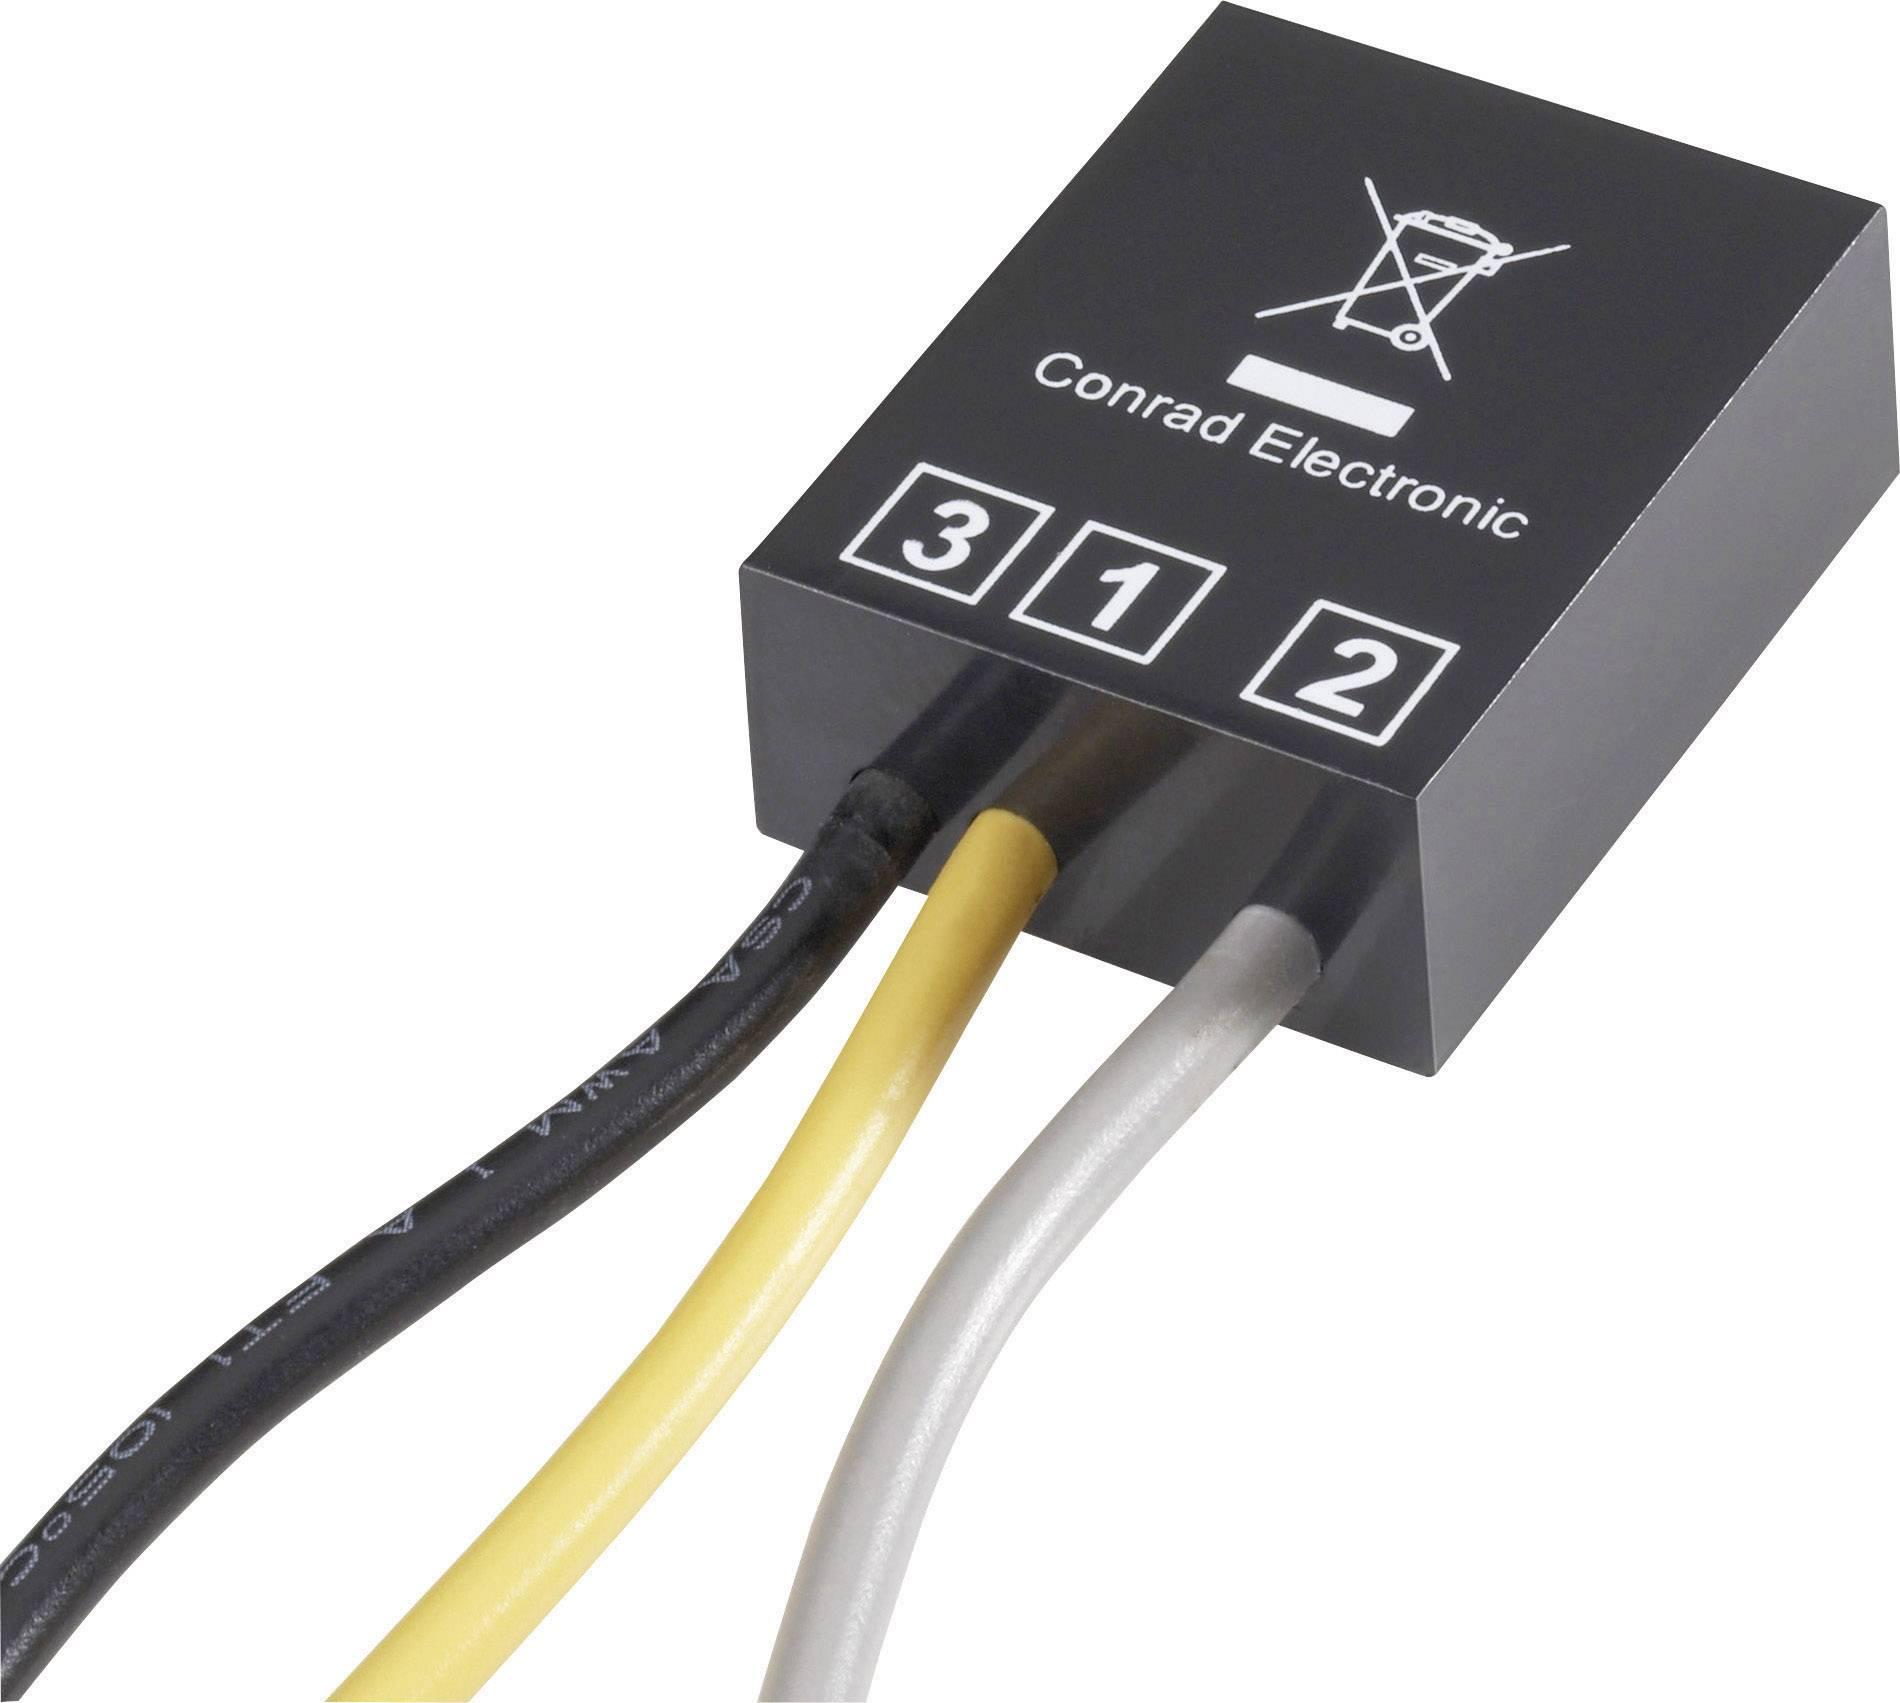 Triakový regulátor otáček a výkonu TRU COMPONENTS 183199 230 V/AC, 15 A, 200 W